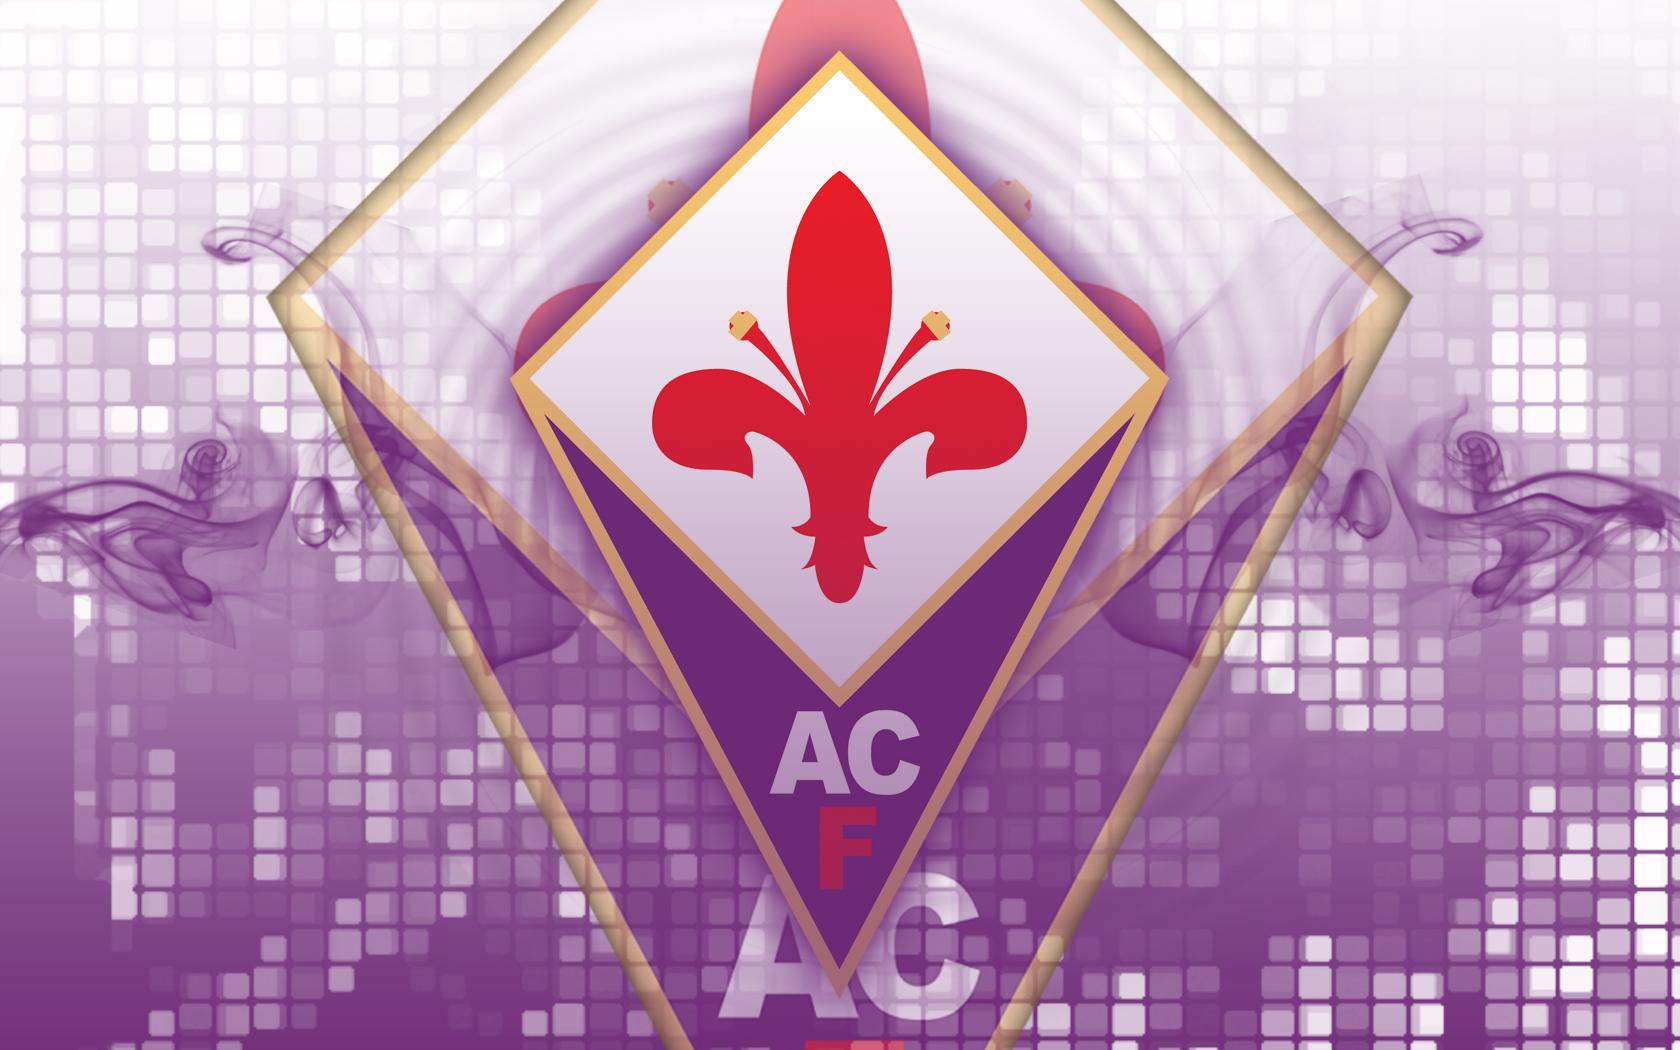 ACF Fiorentina Symbol Wallpaper